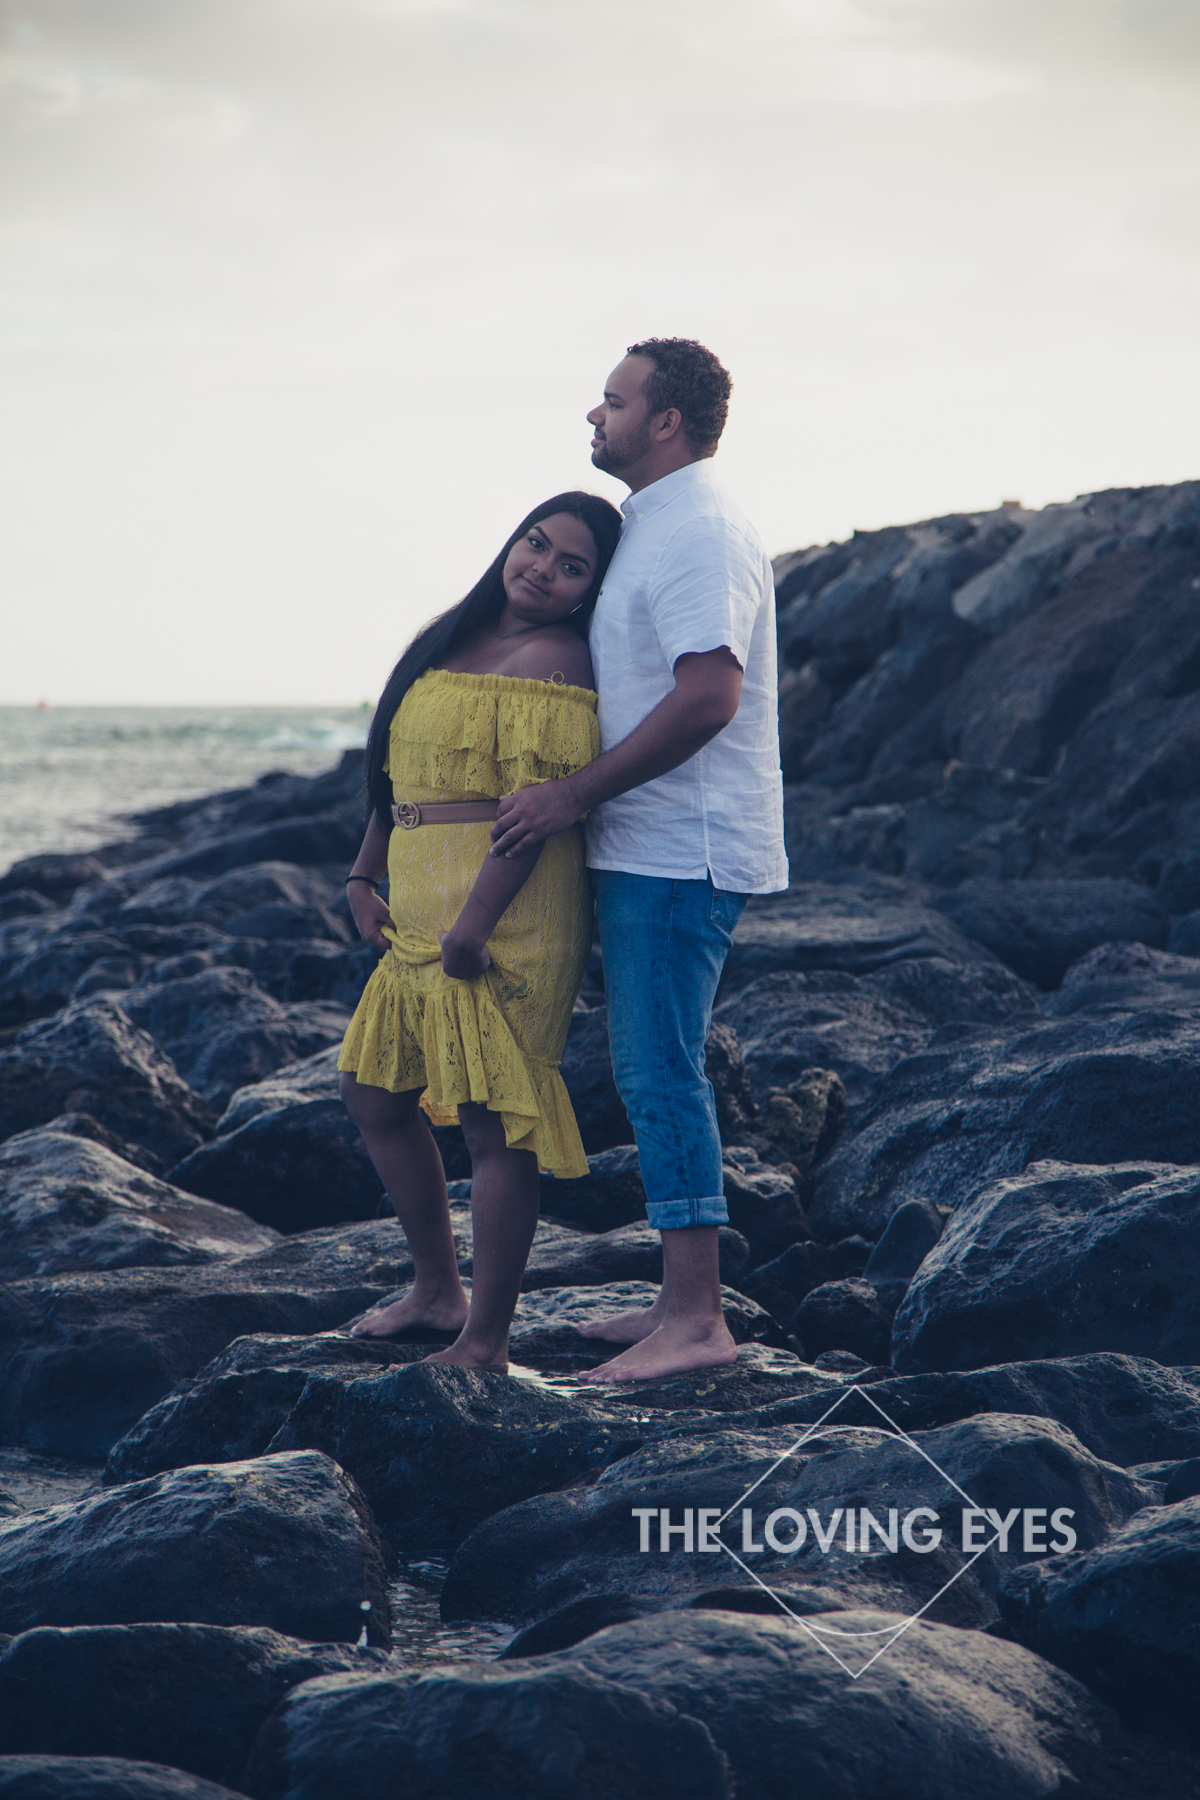 Romantic Hawaii engagement photo on the beach at Ala Moana Beach Park